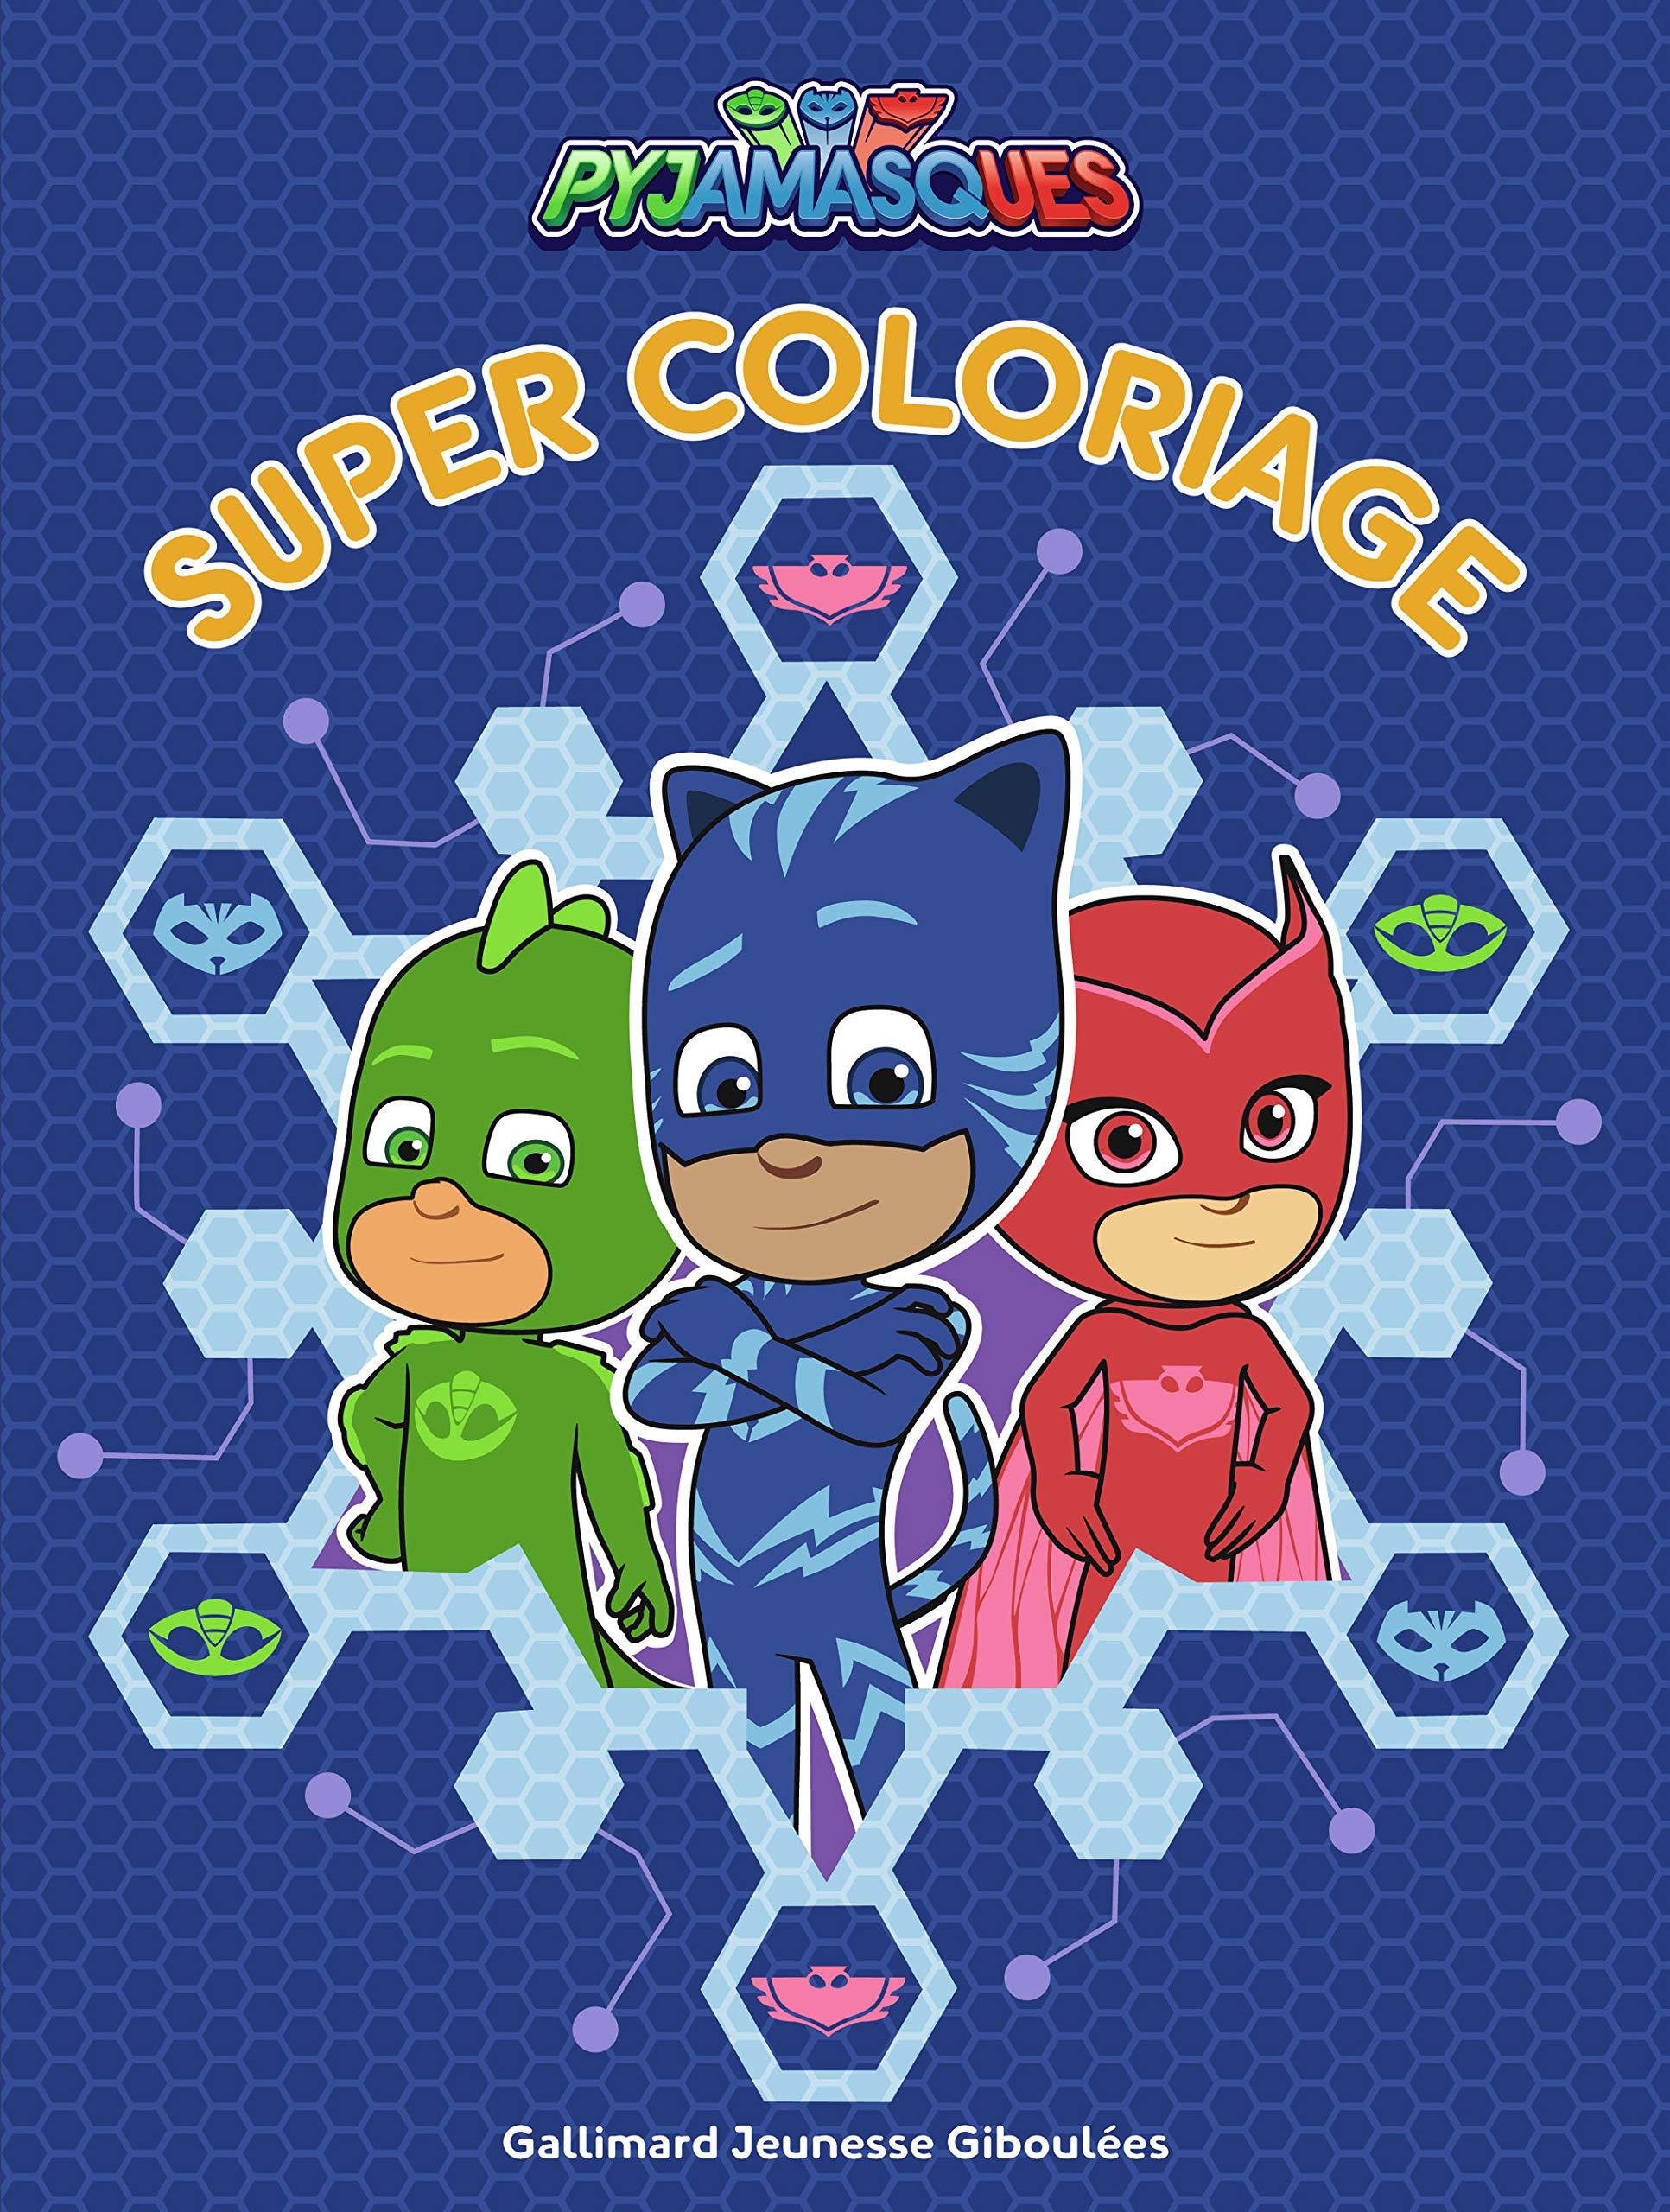 Super Coloriage Pyjamasques Les Pyjamasques Giboulees Series Tv French Edition Romuald 9782075129343 Amazon Com Books